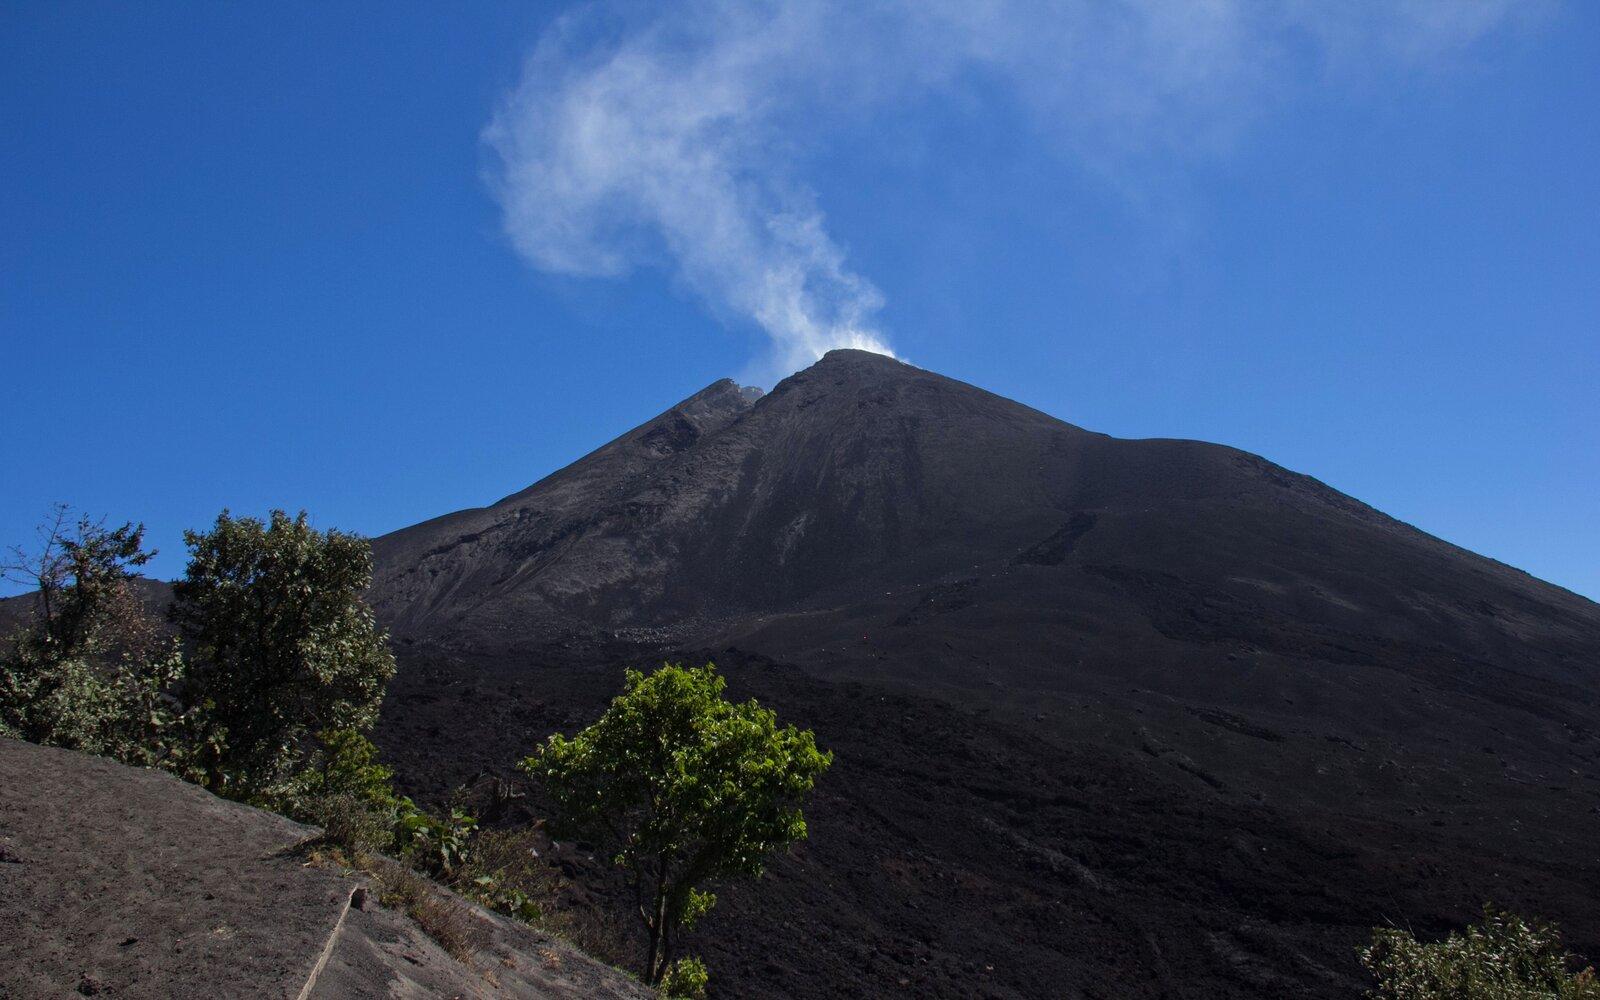 Patrimonio Natural Parque Nacional Volcán de Pacaya